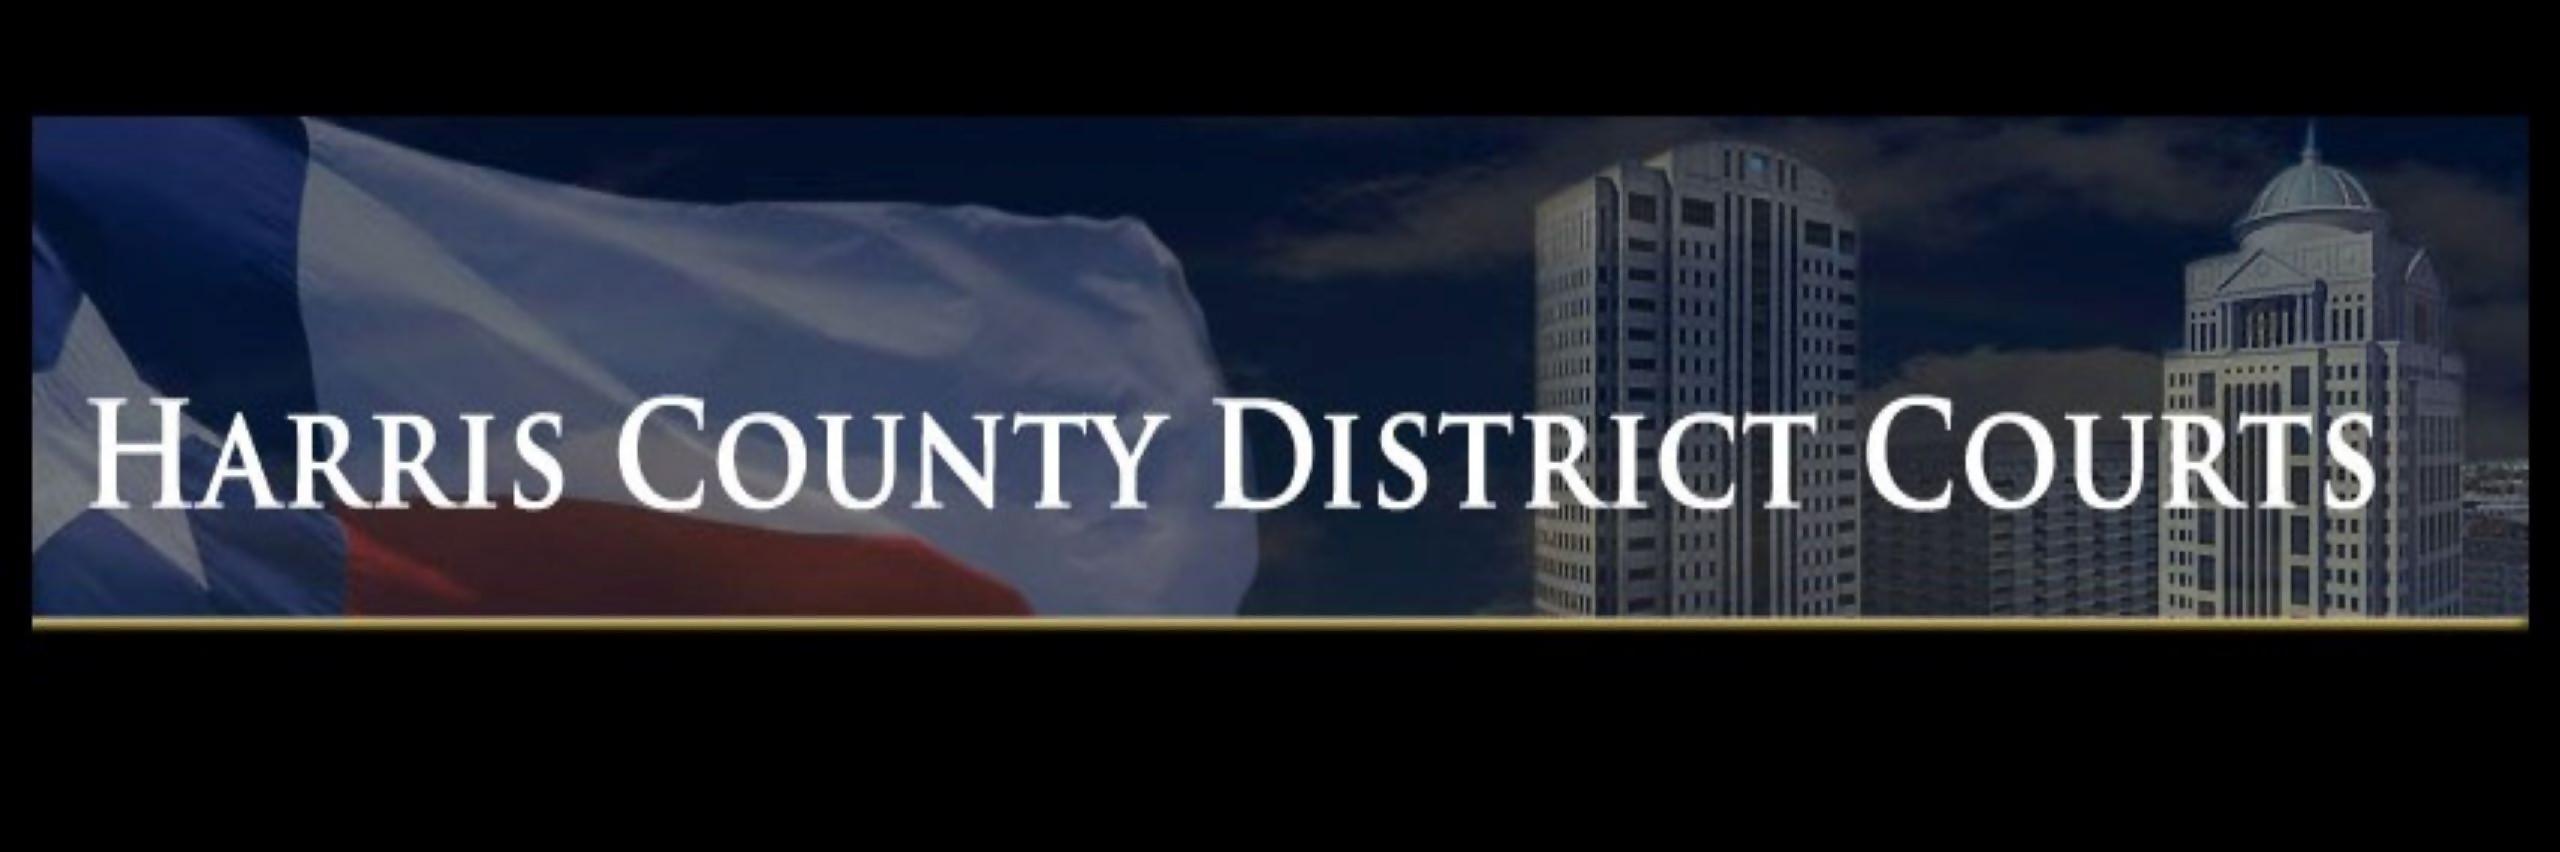 180th District Court - Live Stream